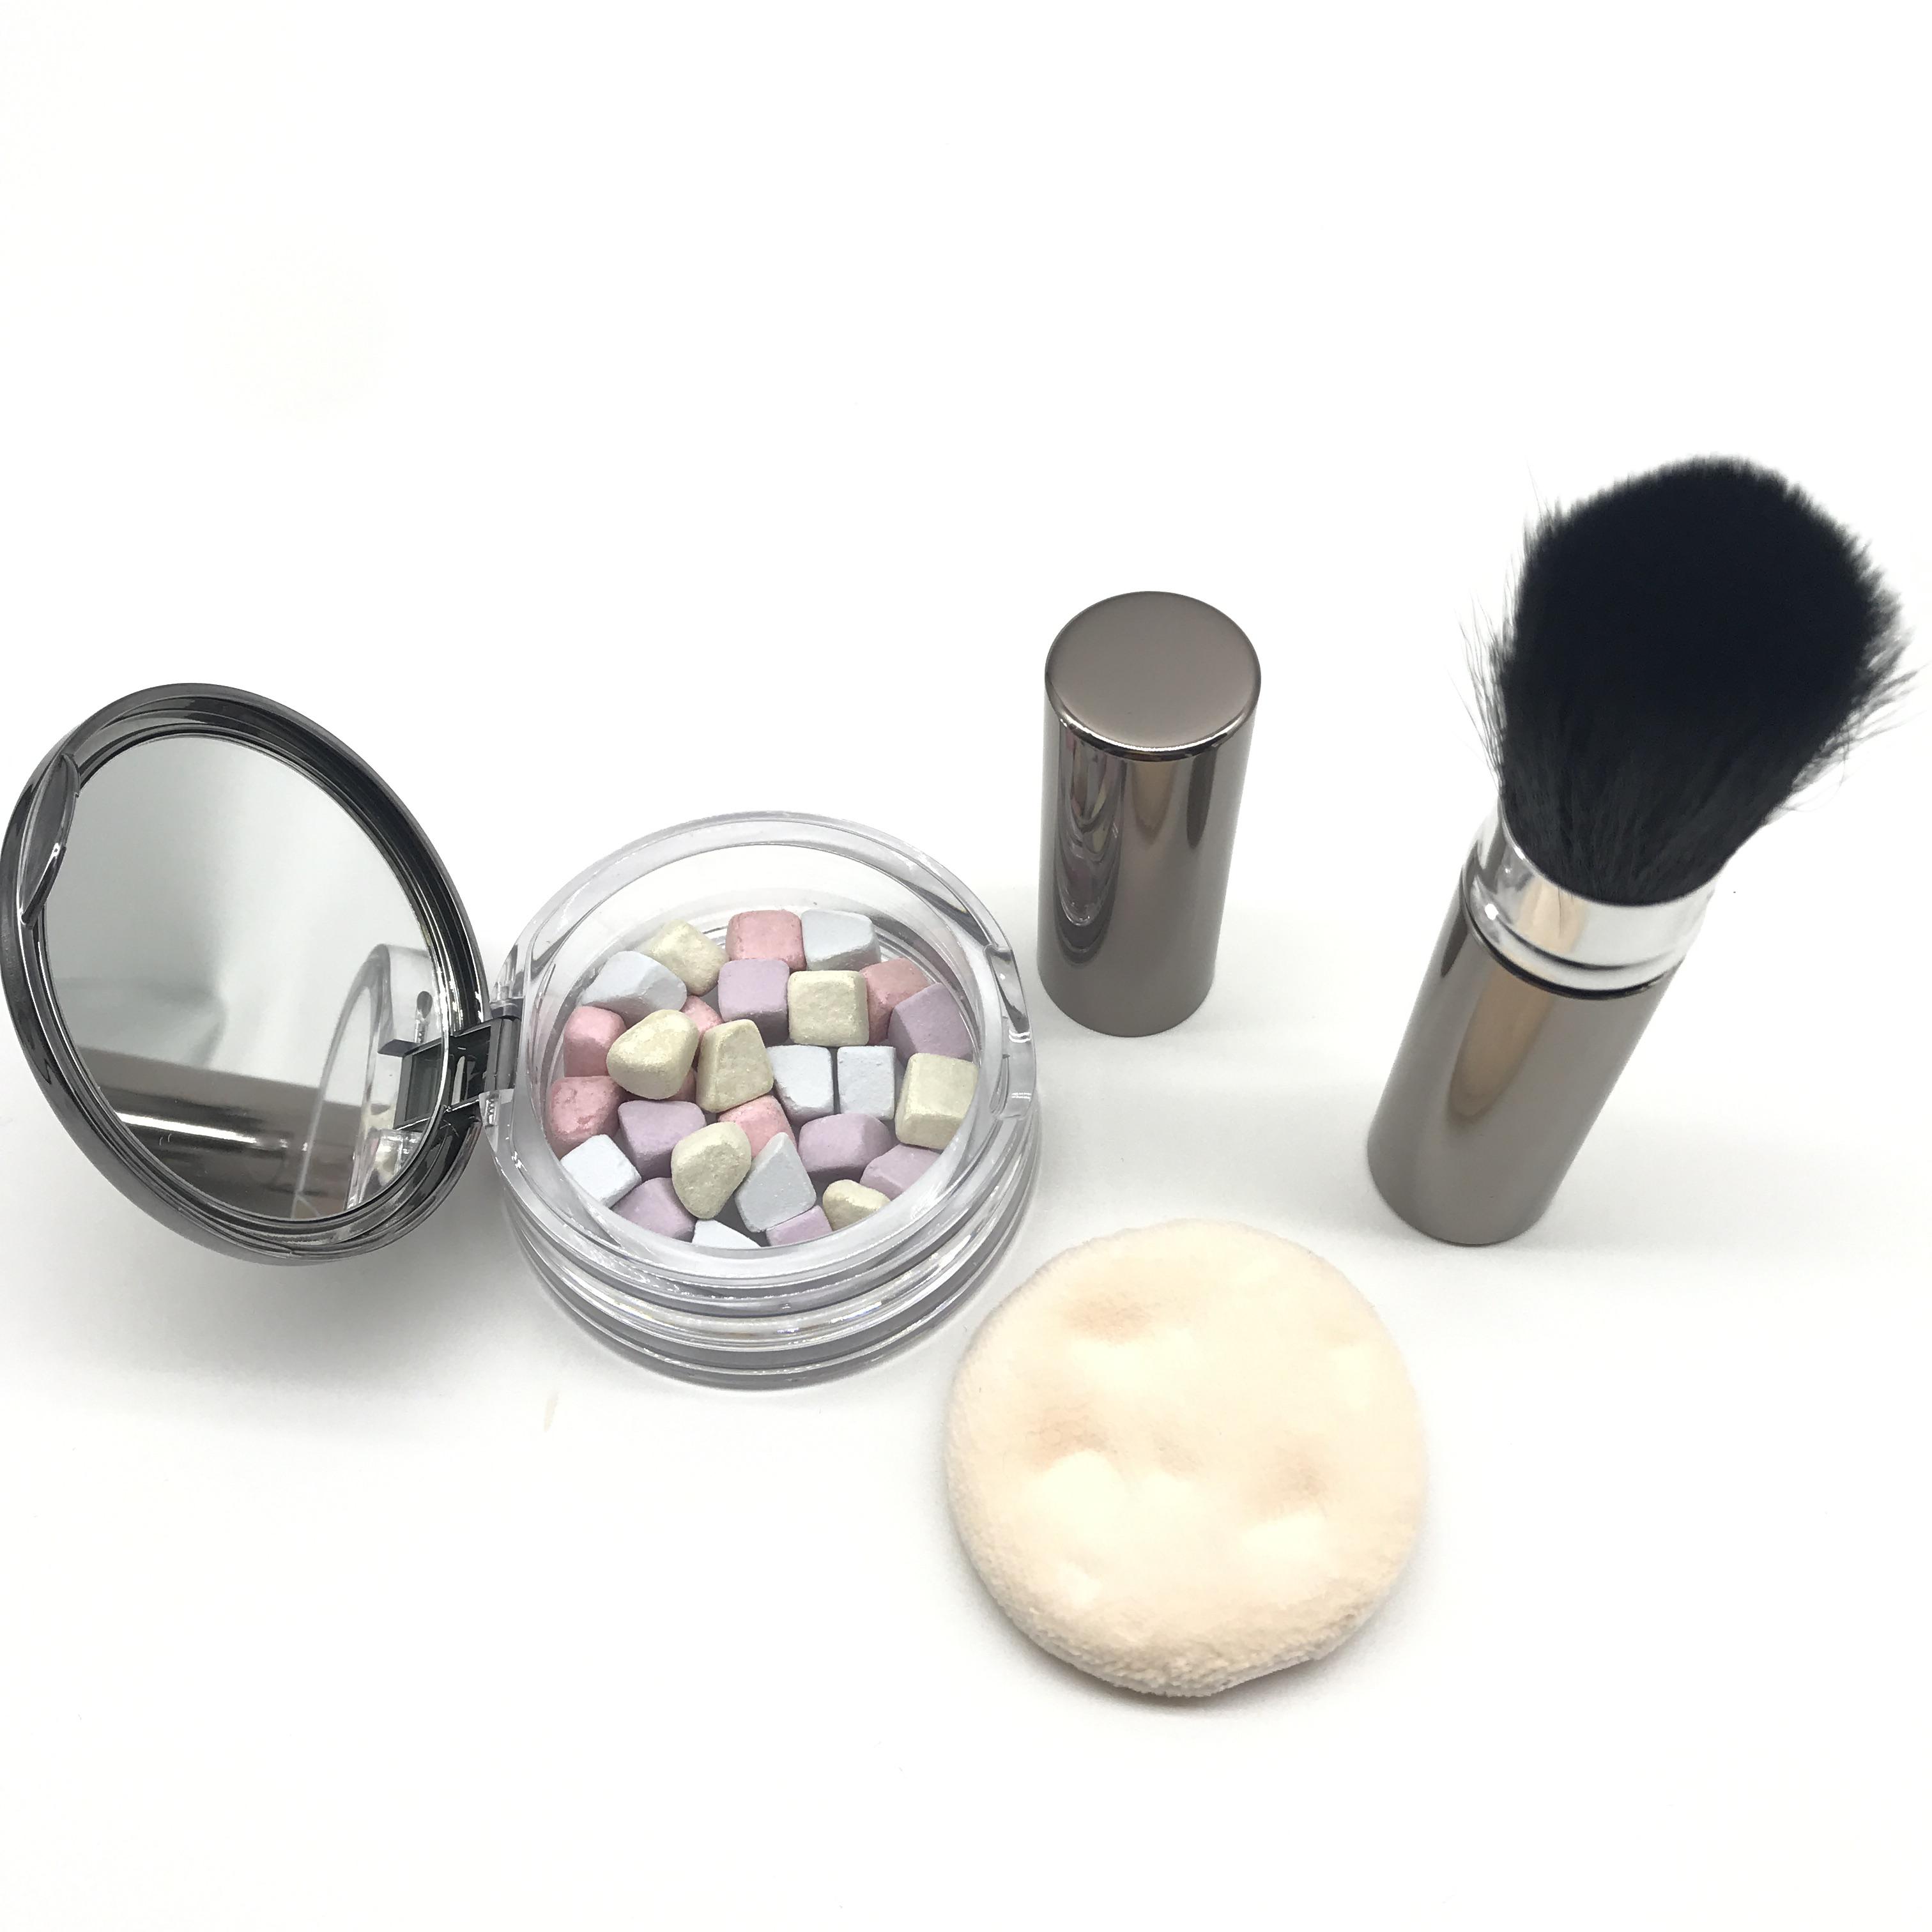 High Quality Cosmetic Contour Concealer Granule Your Own Face Blush Contour Stick For Makeup